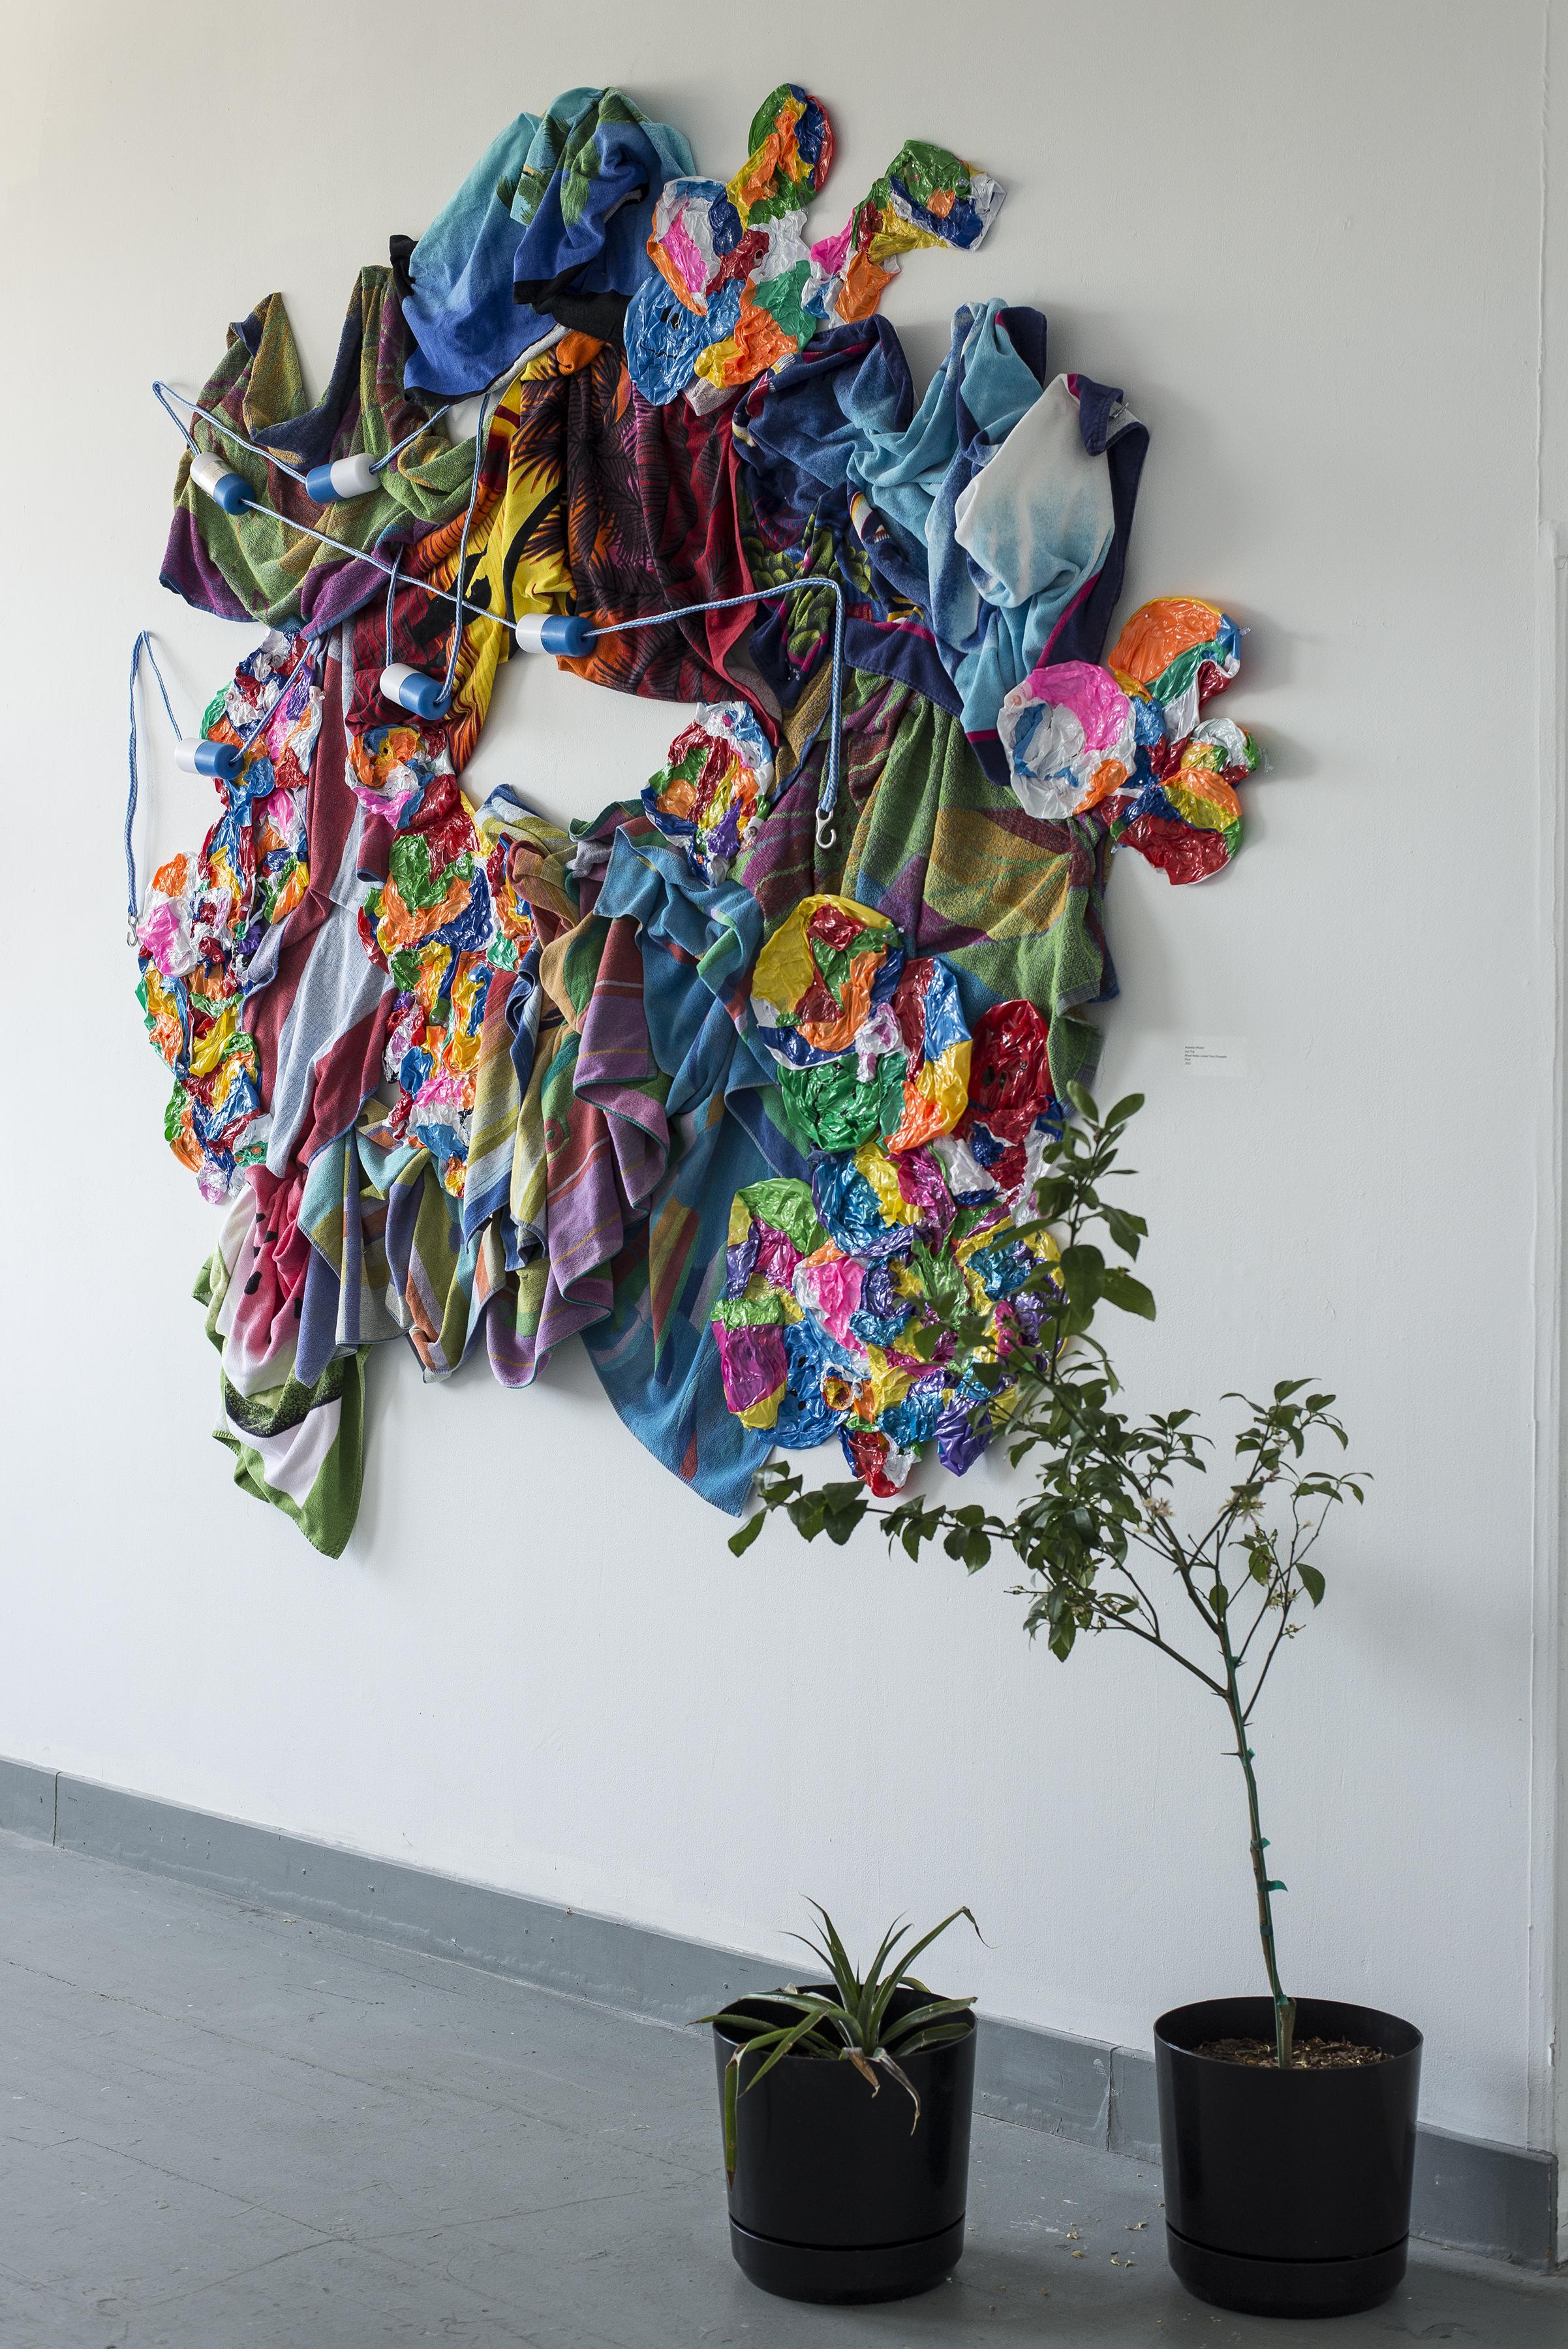 Day Trip    Mixed Media Installation, Pineapple Plant, Meyer Lemon Tree  14'x12'  2015